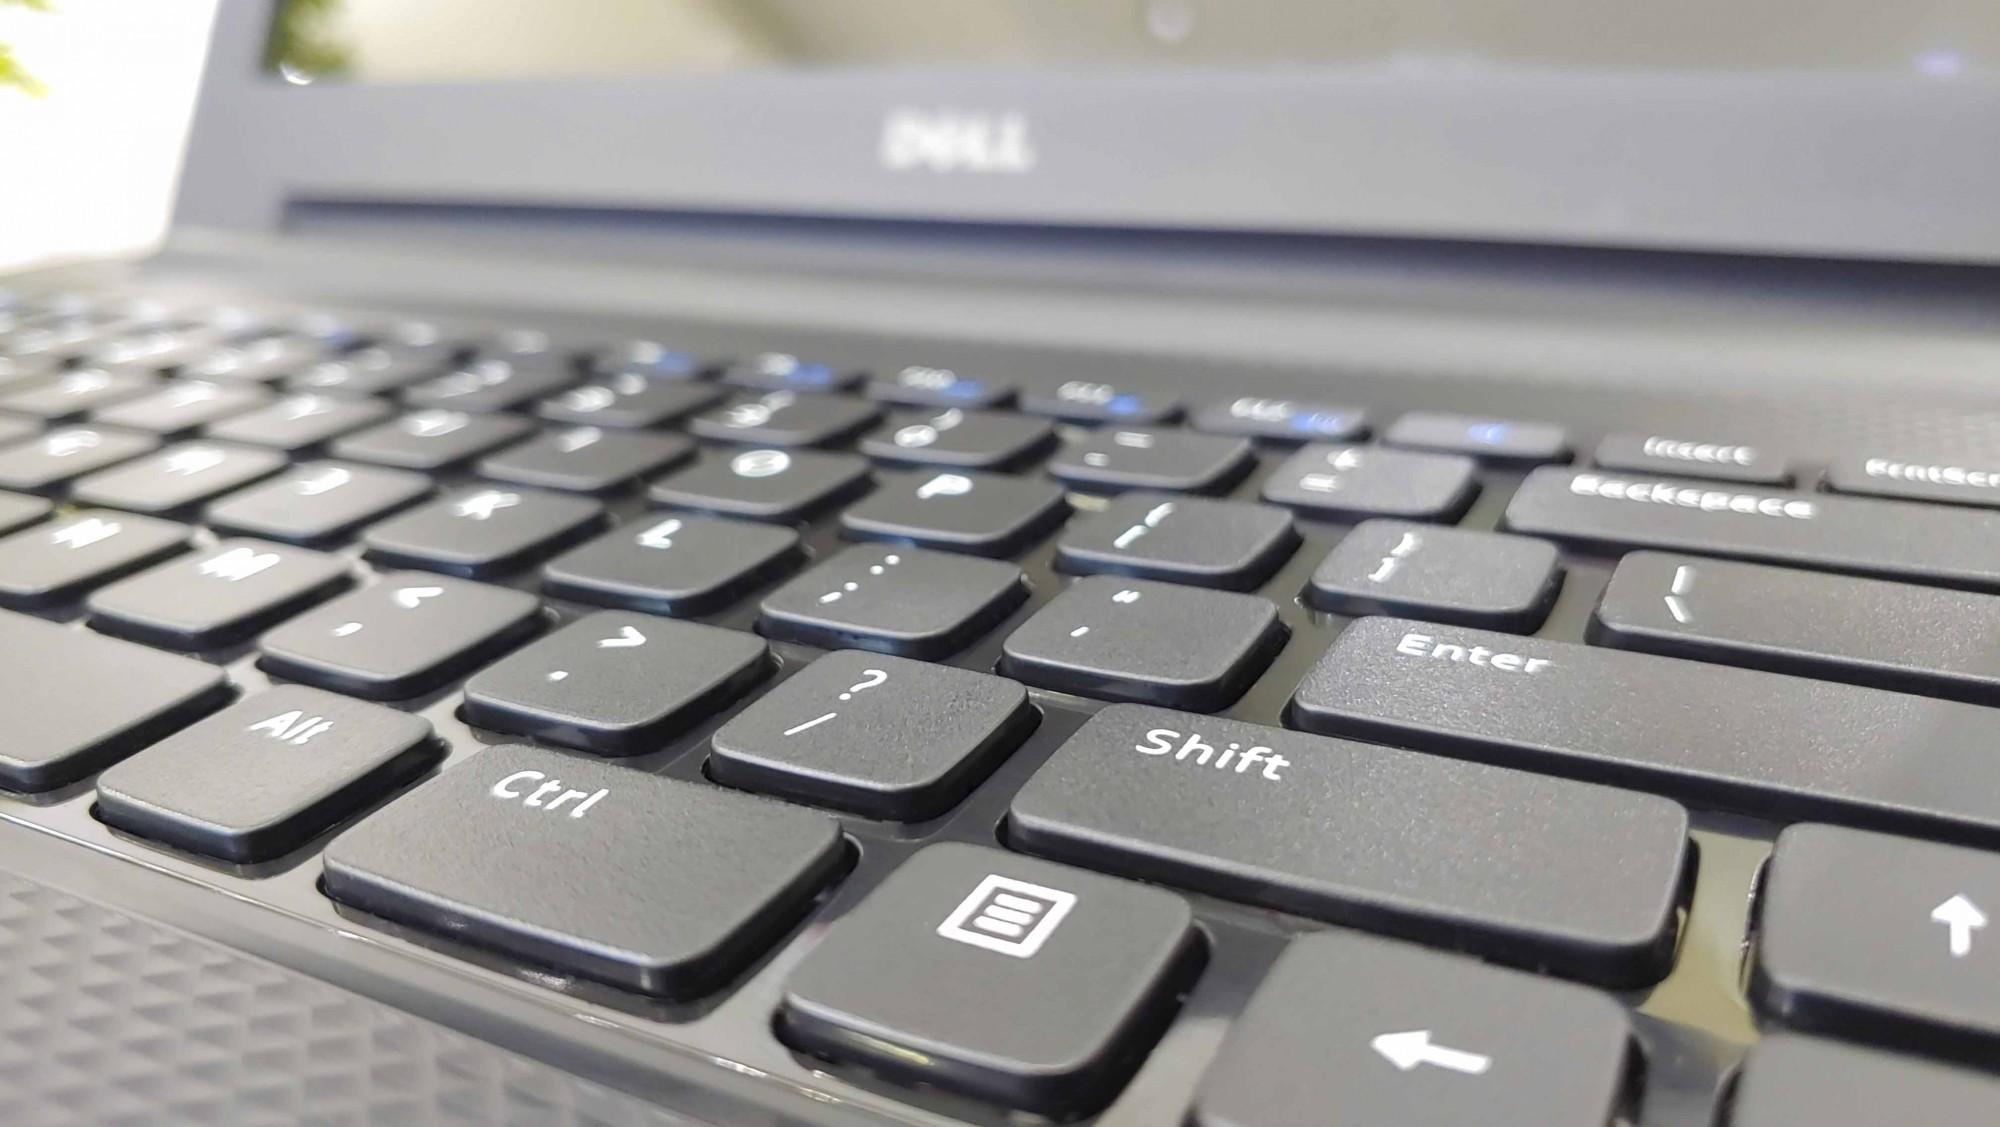 Laptop Dell 3421